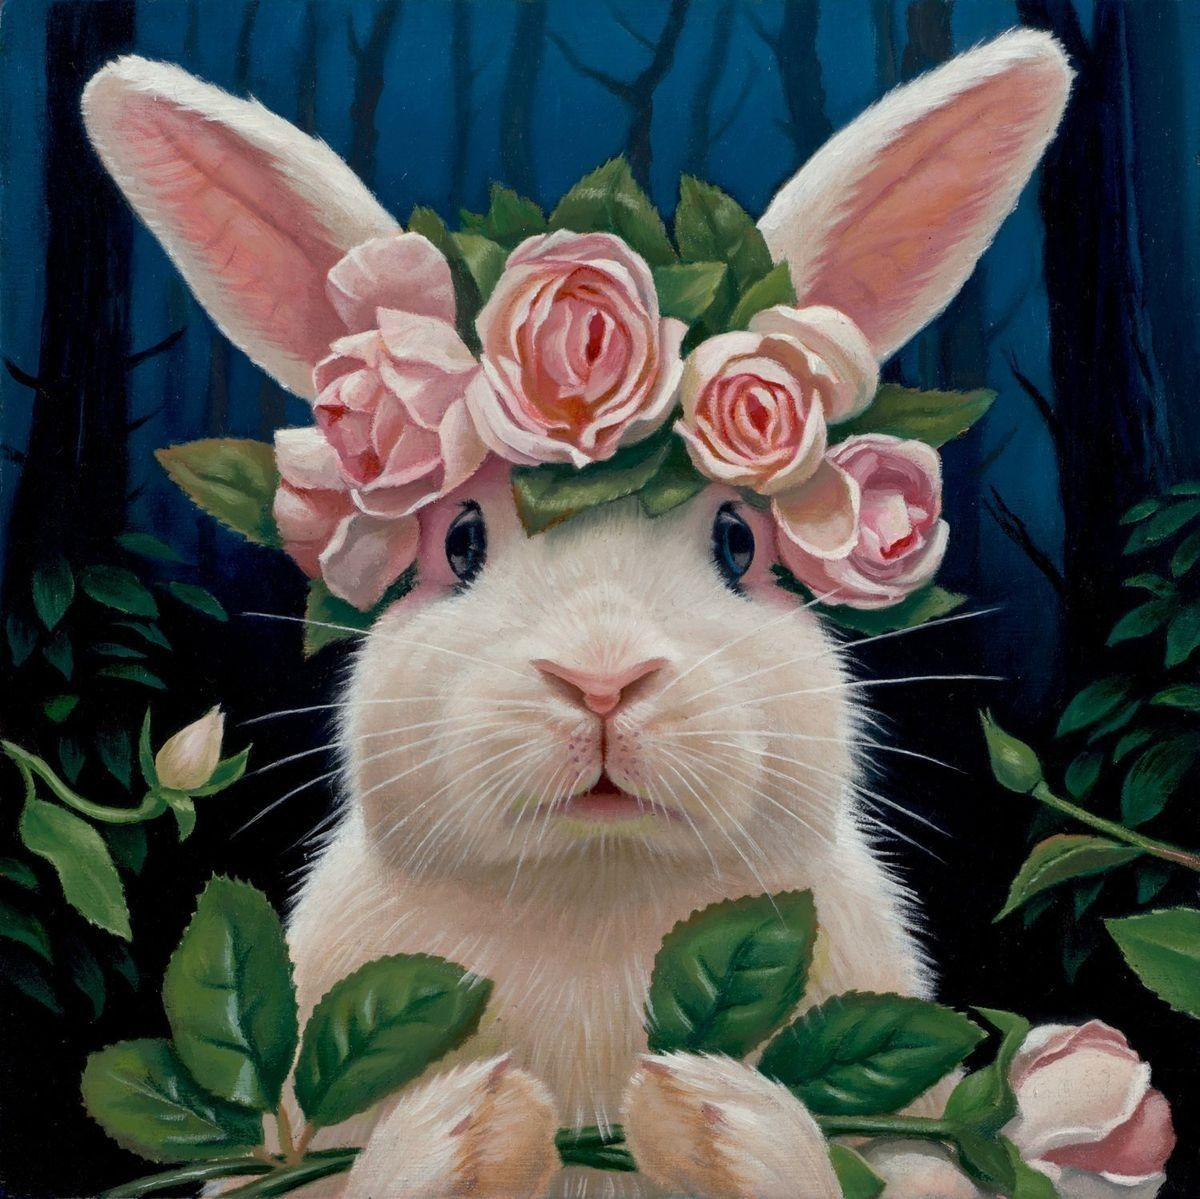 Pin by RHONDA GERMAIN on Pictures Bunny art, Animal art